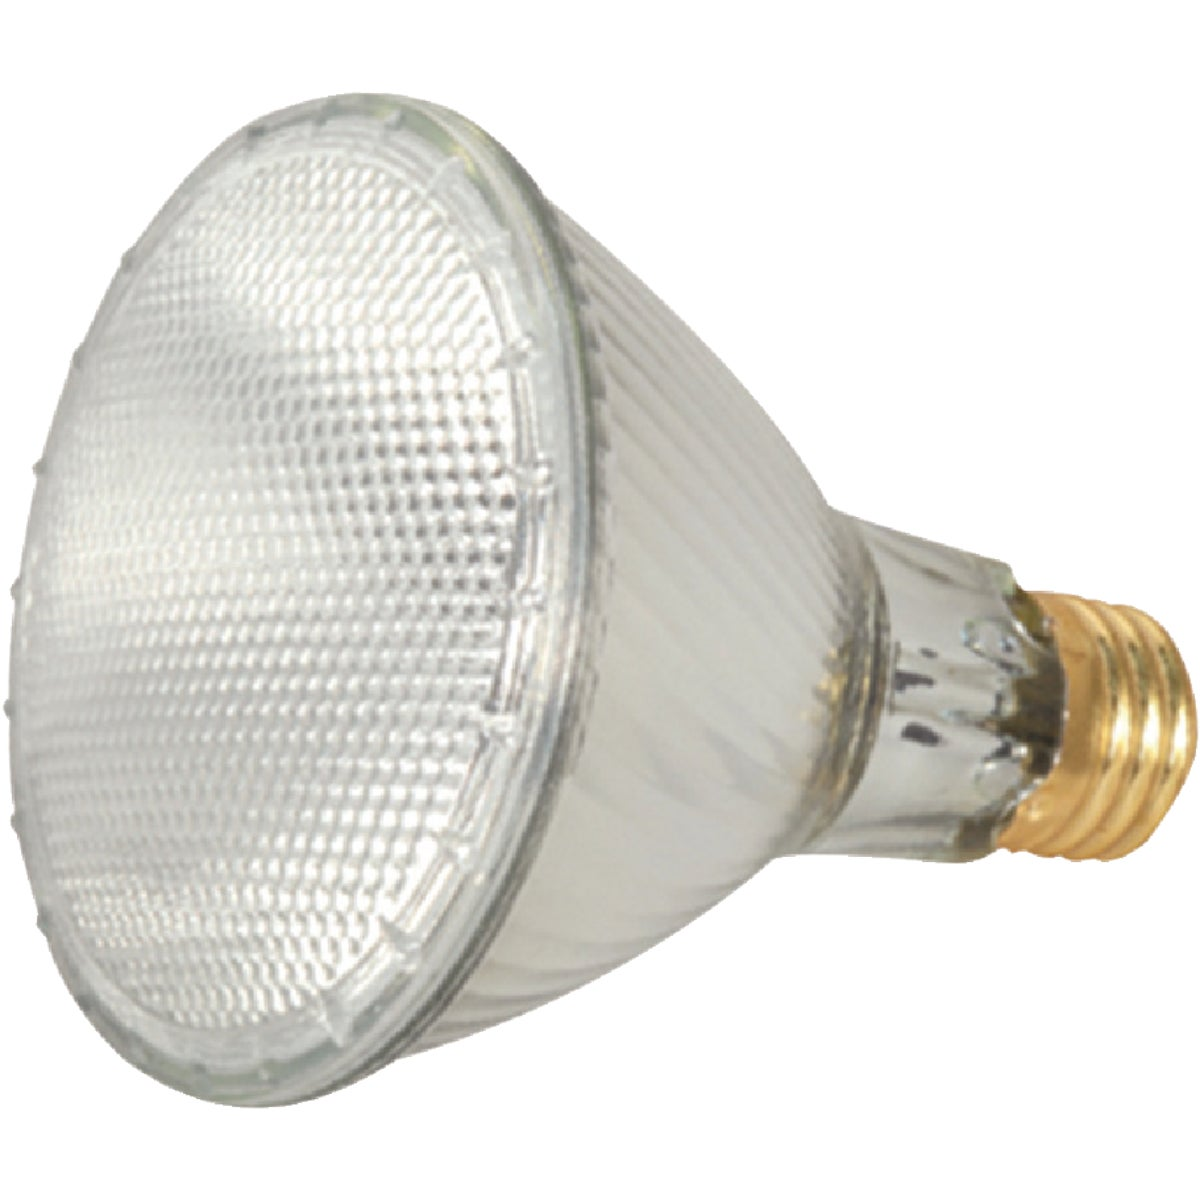 38W PAR30 LN SPOT BULB - 69169 by G E Lighting